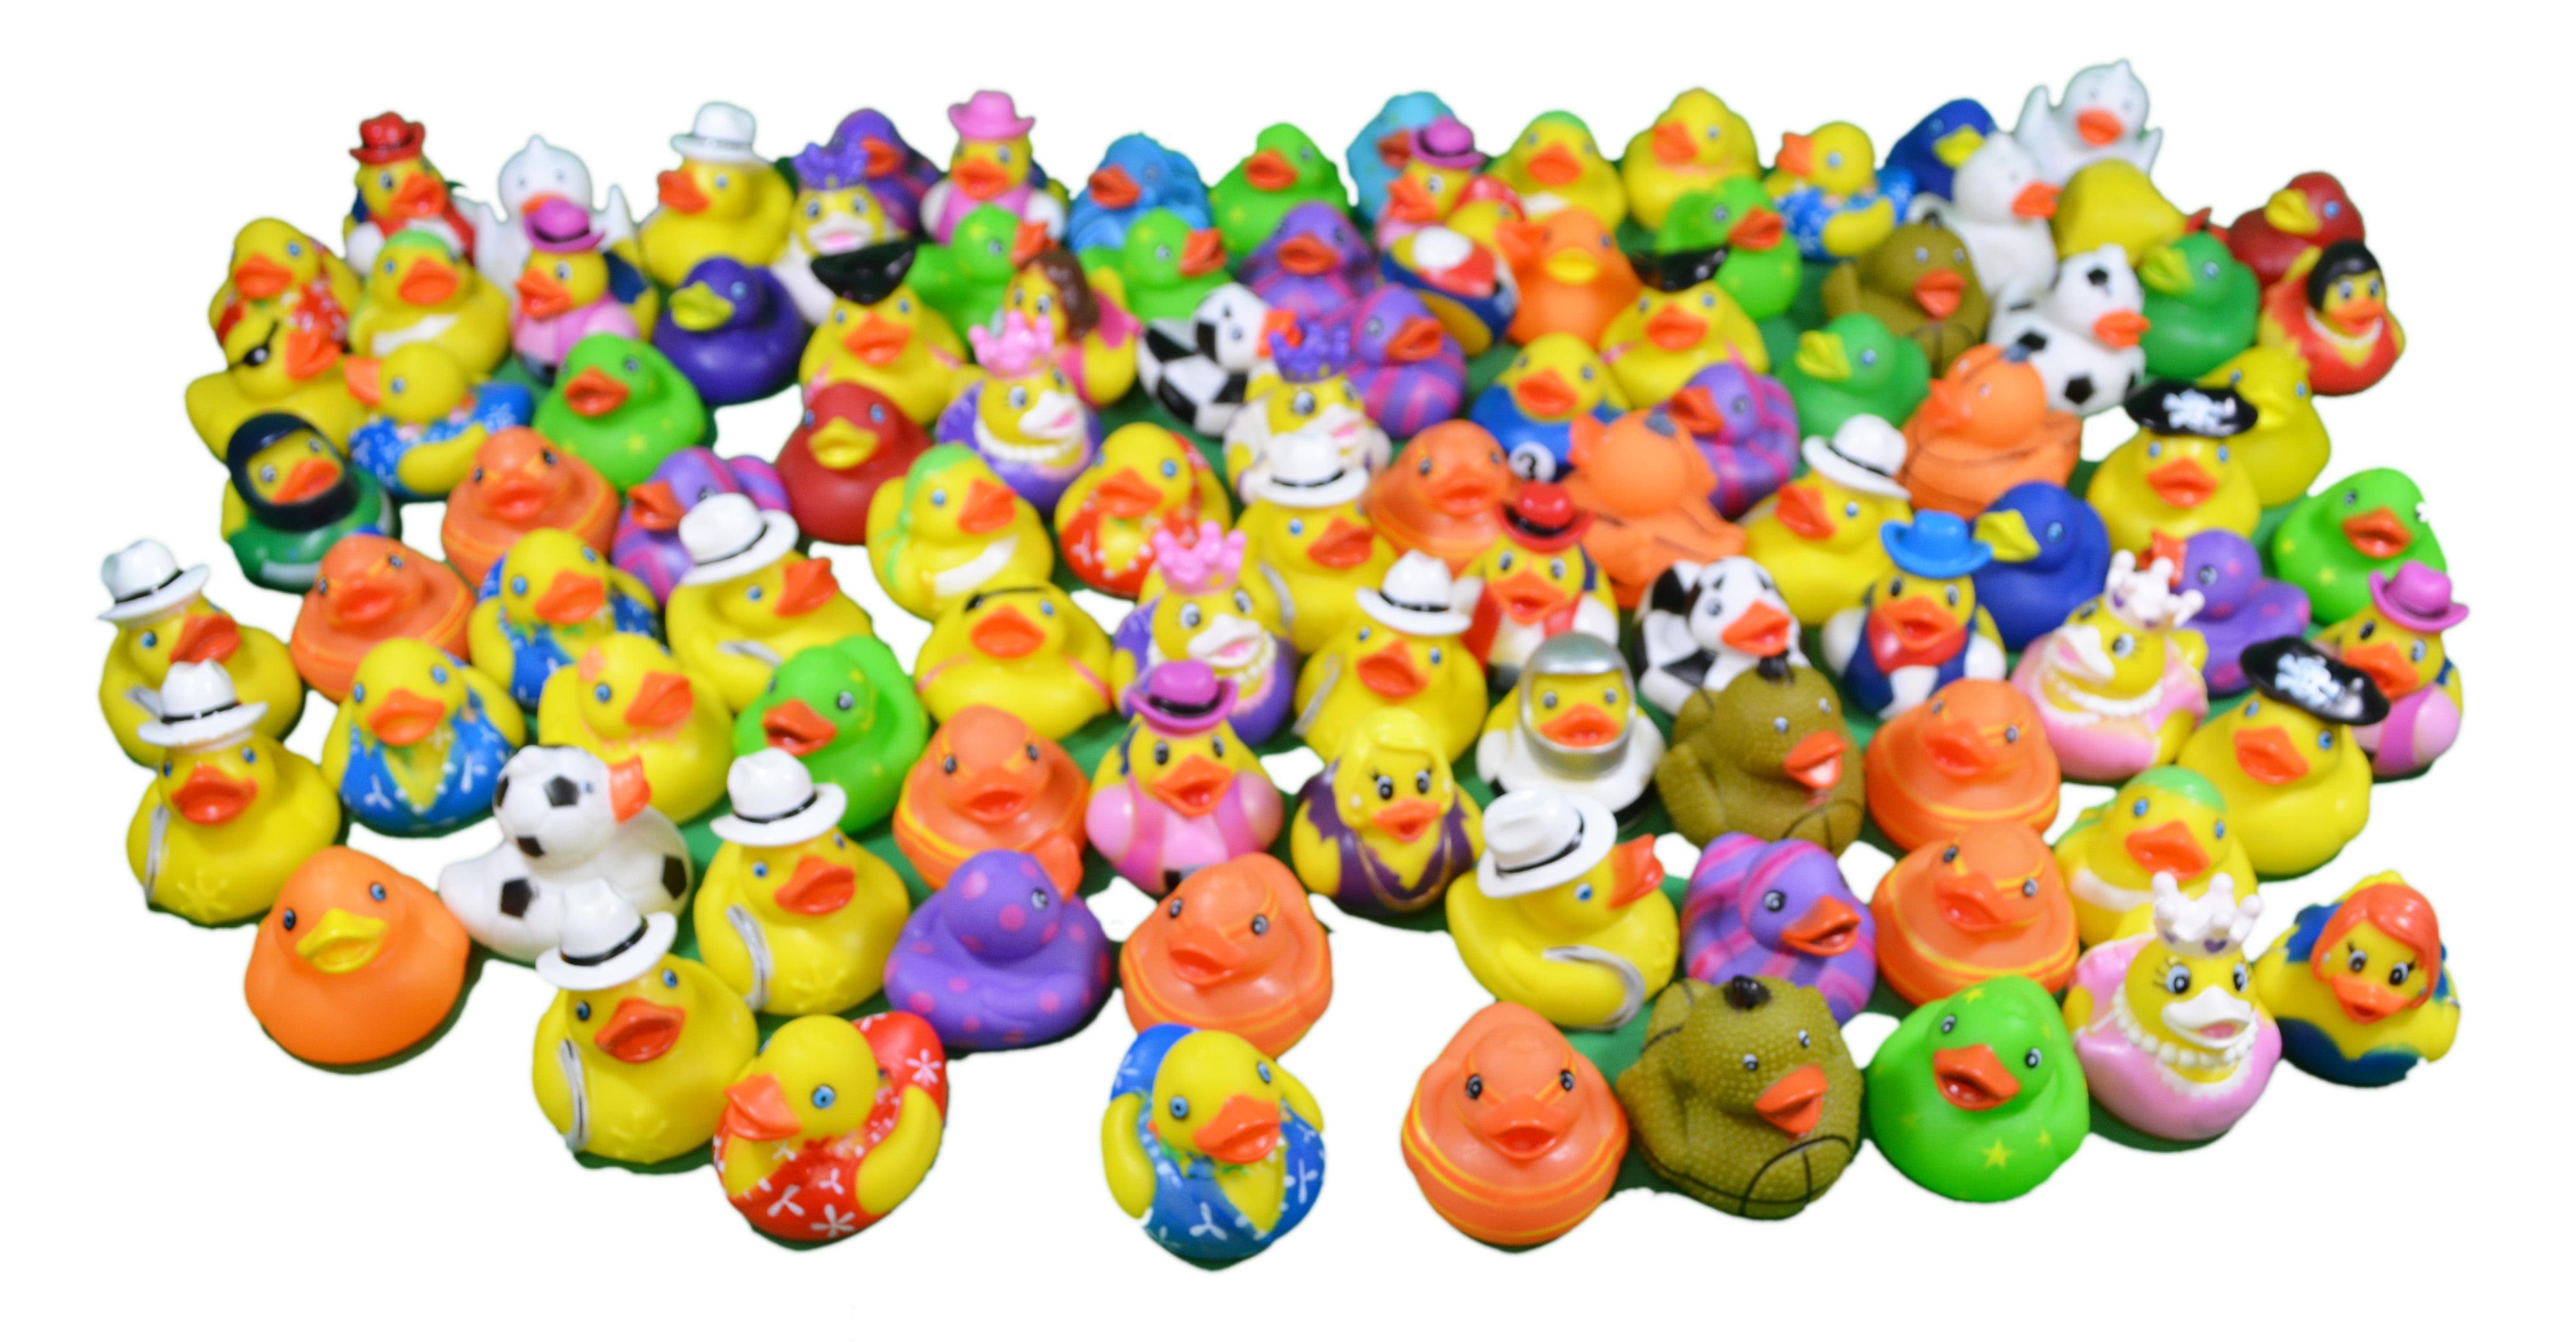 Huge Mega Lot 100 Mini Rubber Ducks Party Favors Carnival Fundraiser ...